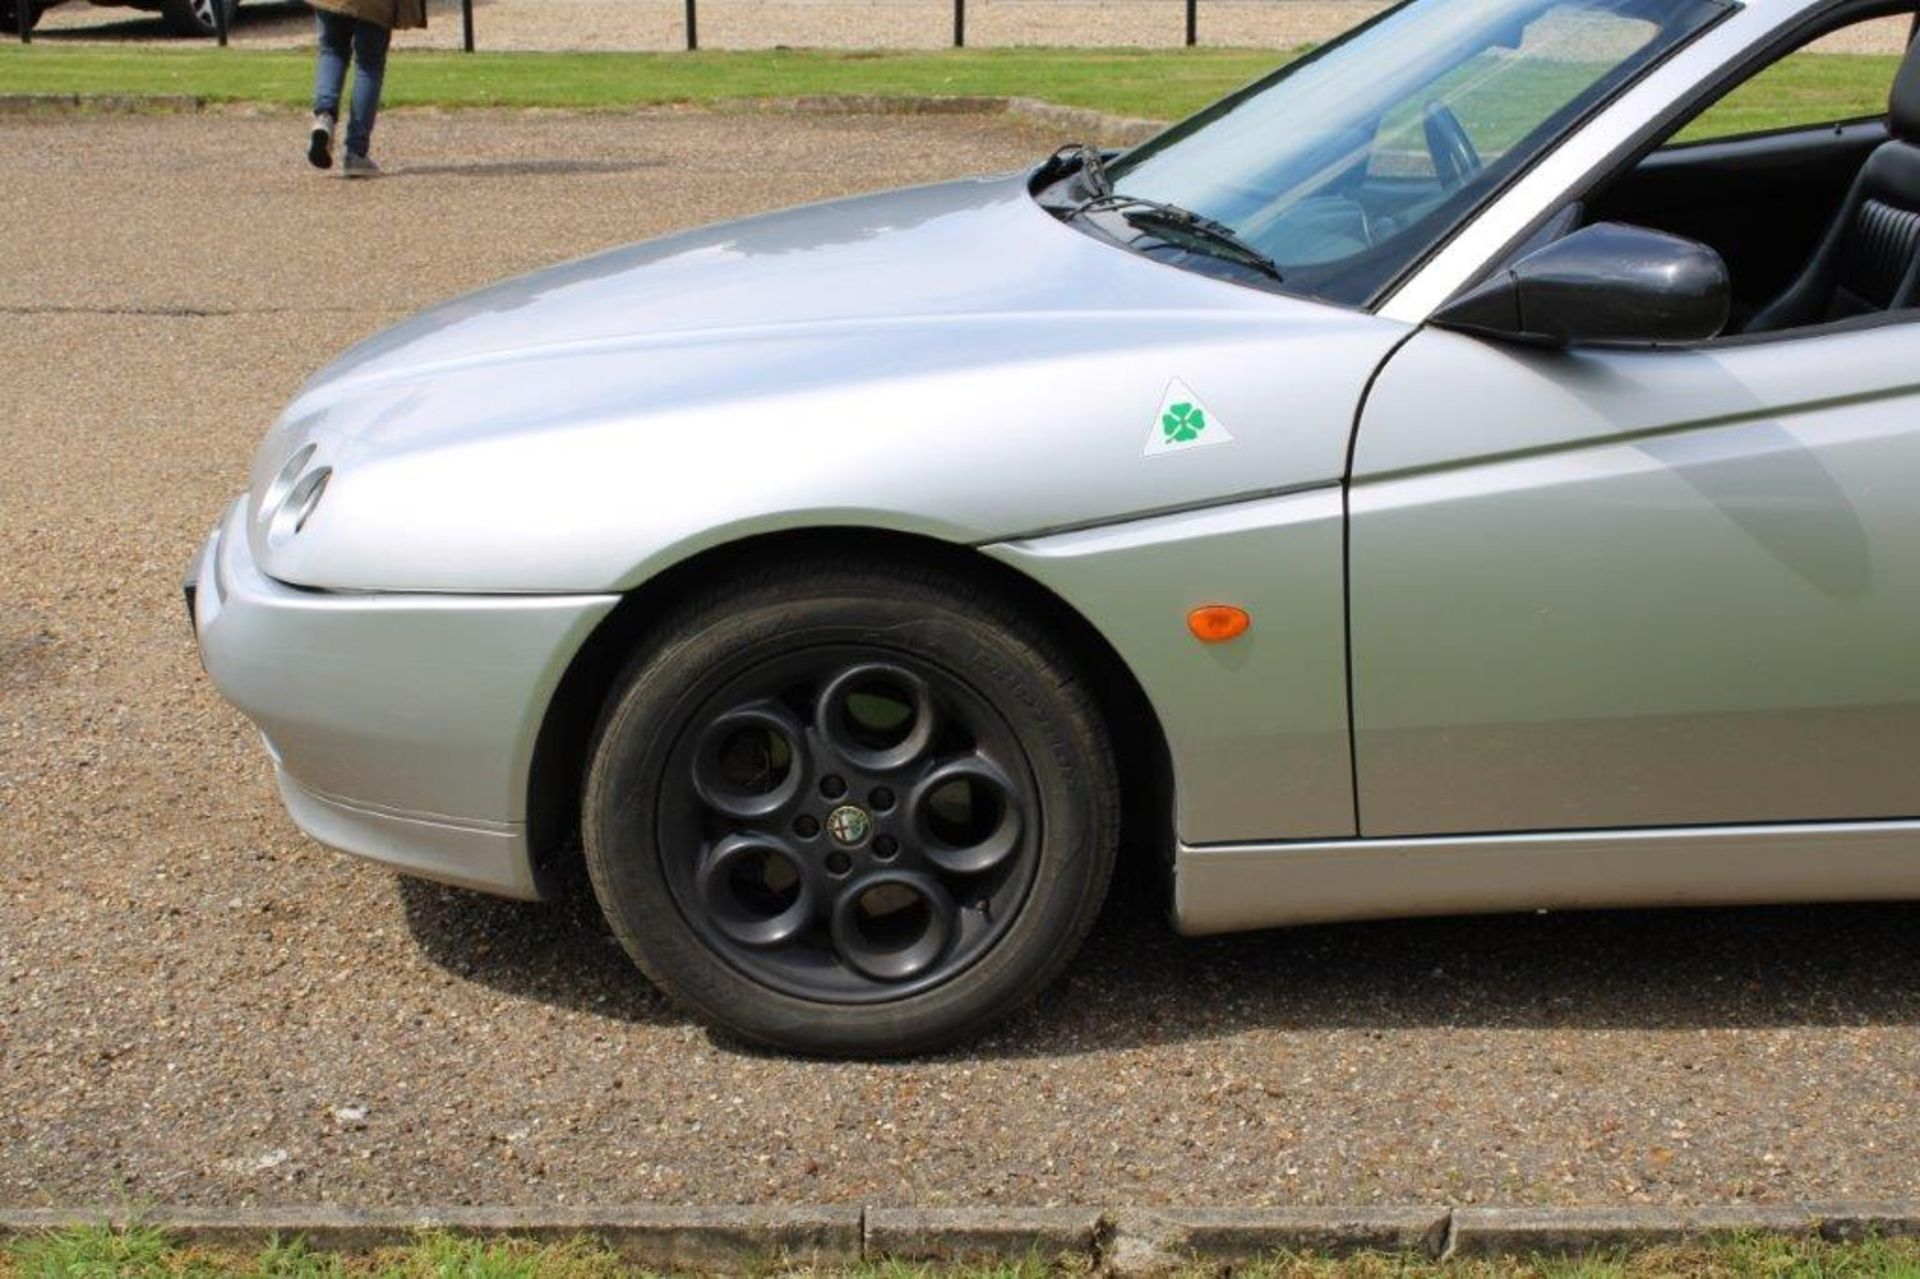 1999 Alfa Romeo GTV Lusso T-Spark 16v - Image 8 of 18